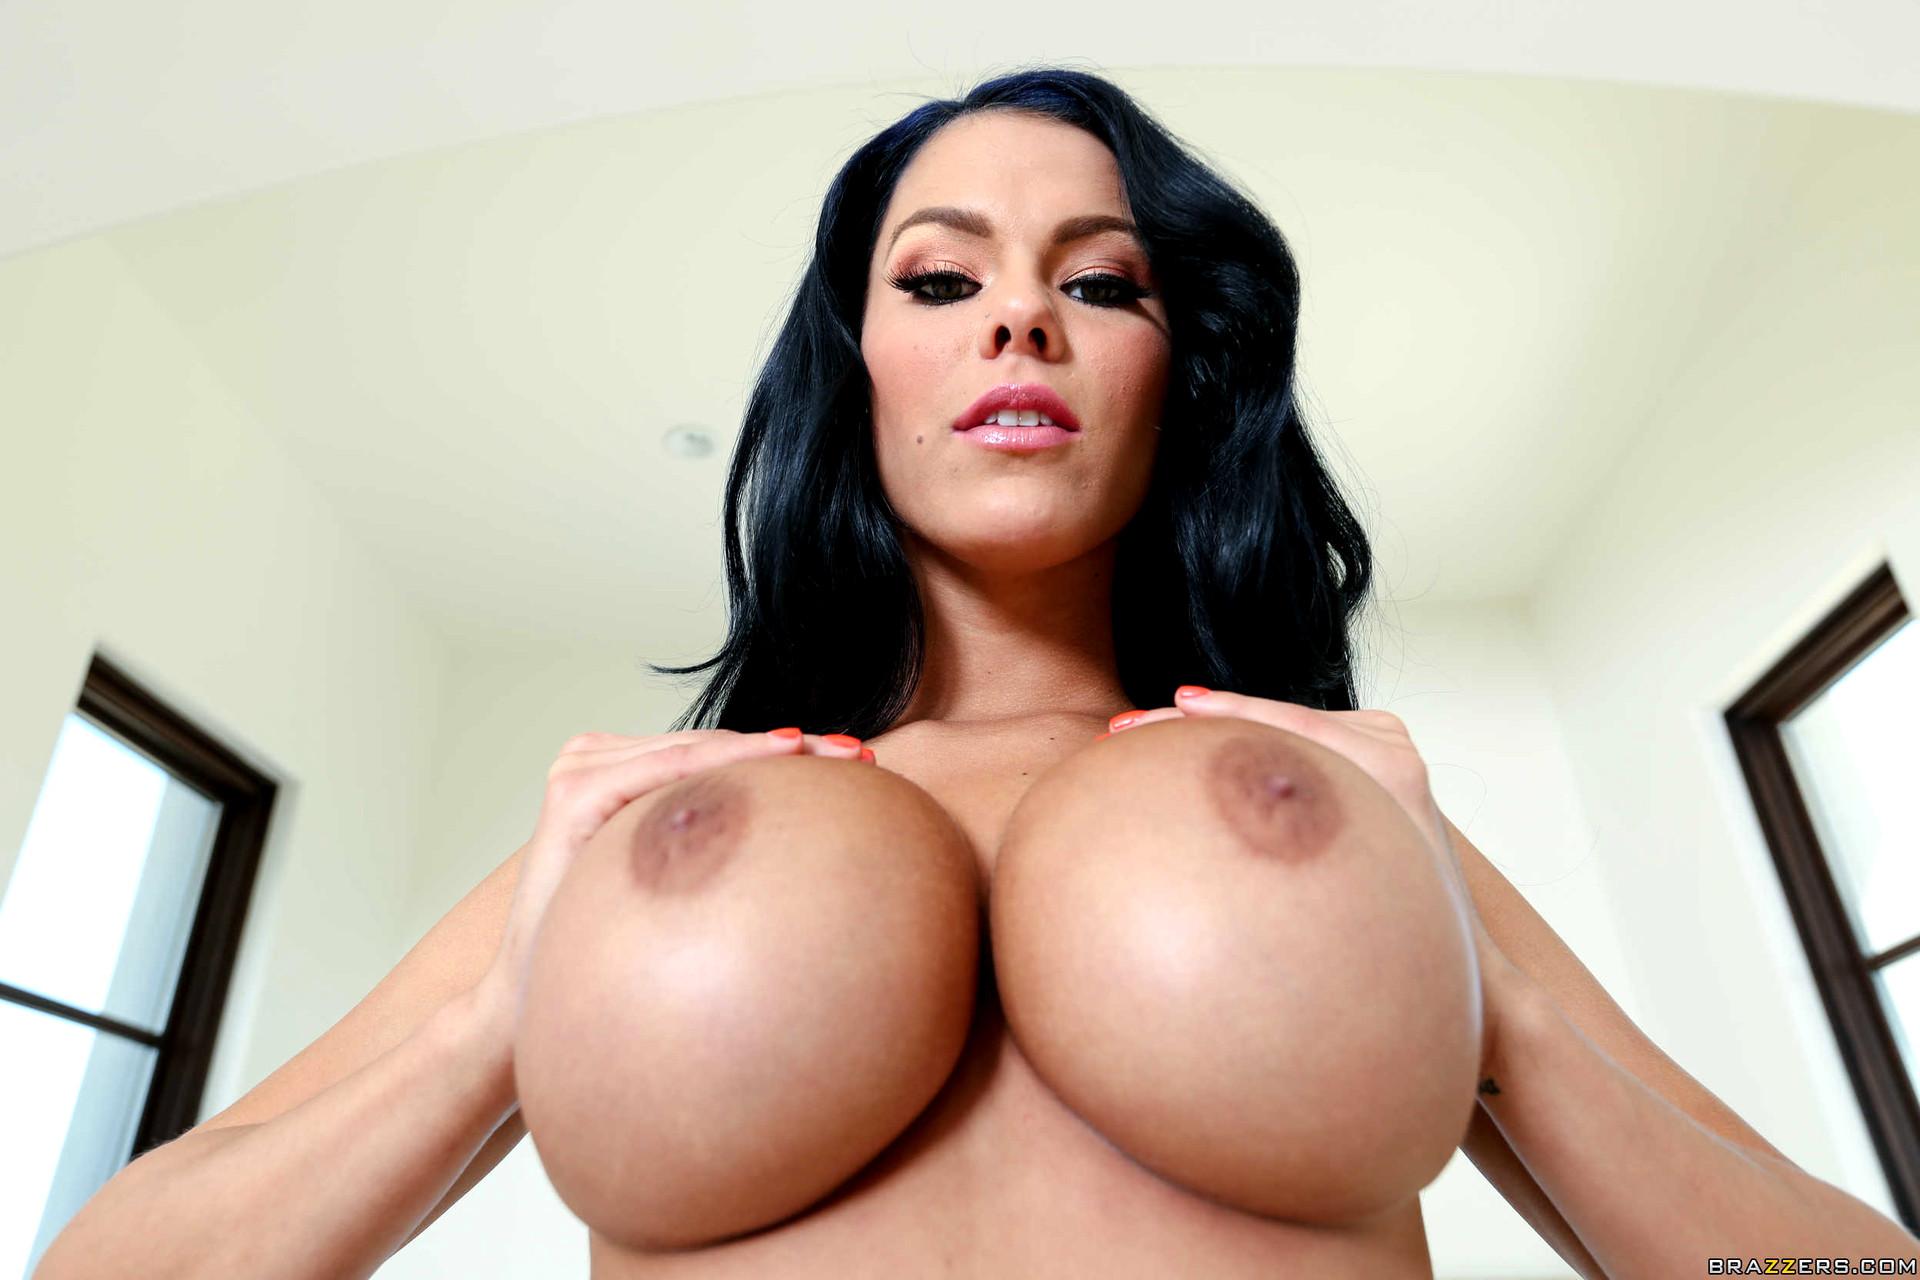 Uk hottie peta todd showing off her hot naked bod